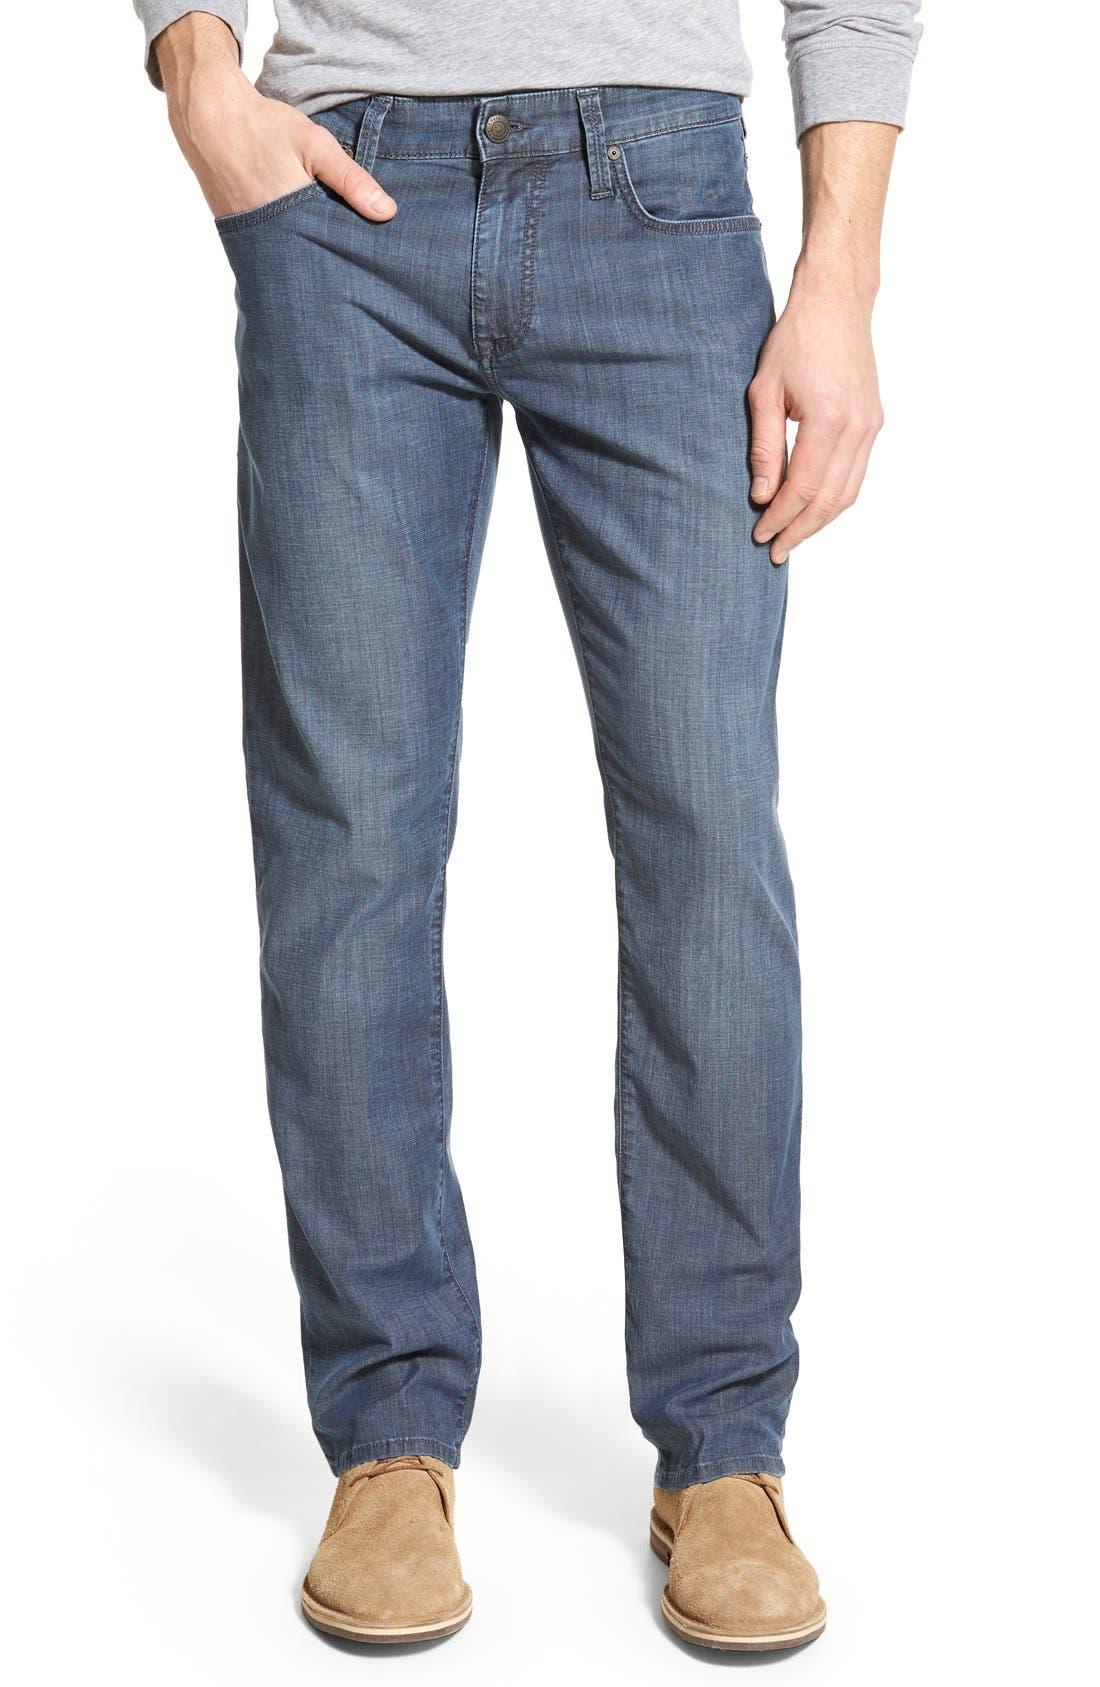 Alternate Image 1 Selected - Mavi Jeans 'Zach' Straight Leg Jeans (Chambray) (Regular & Tall)